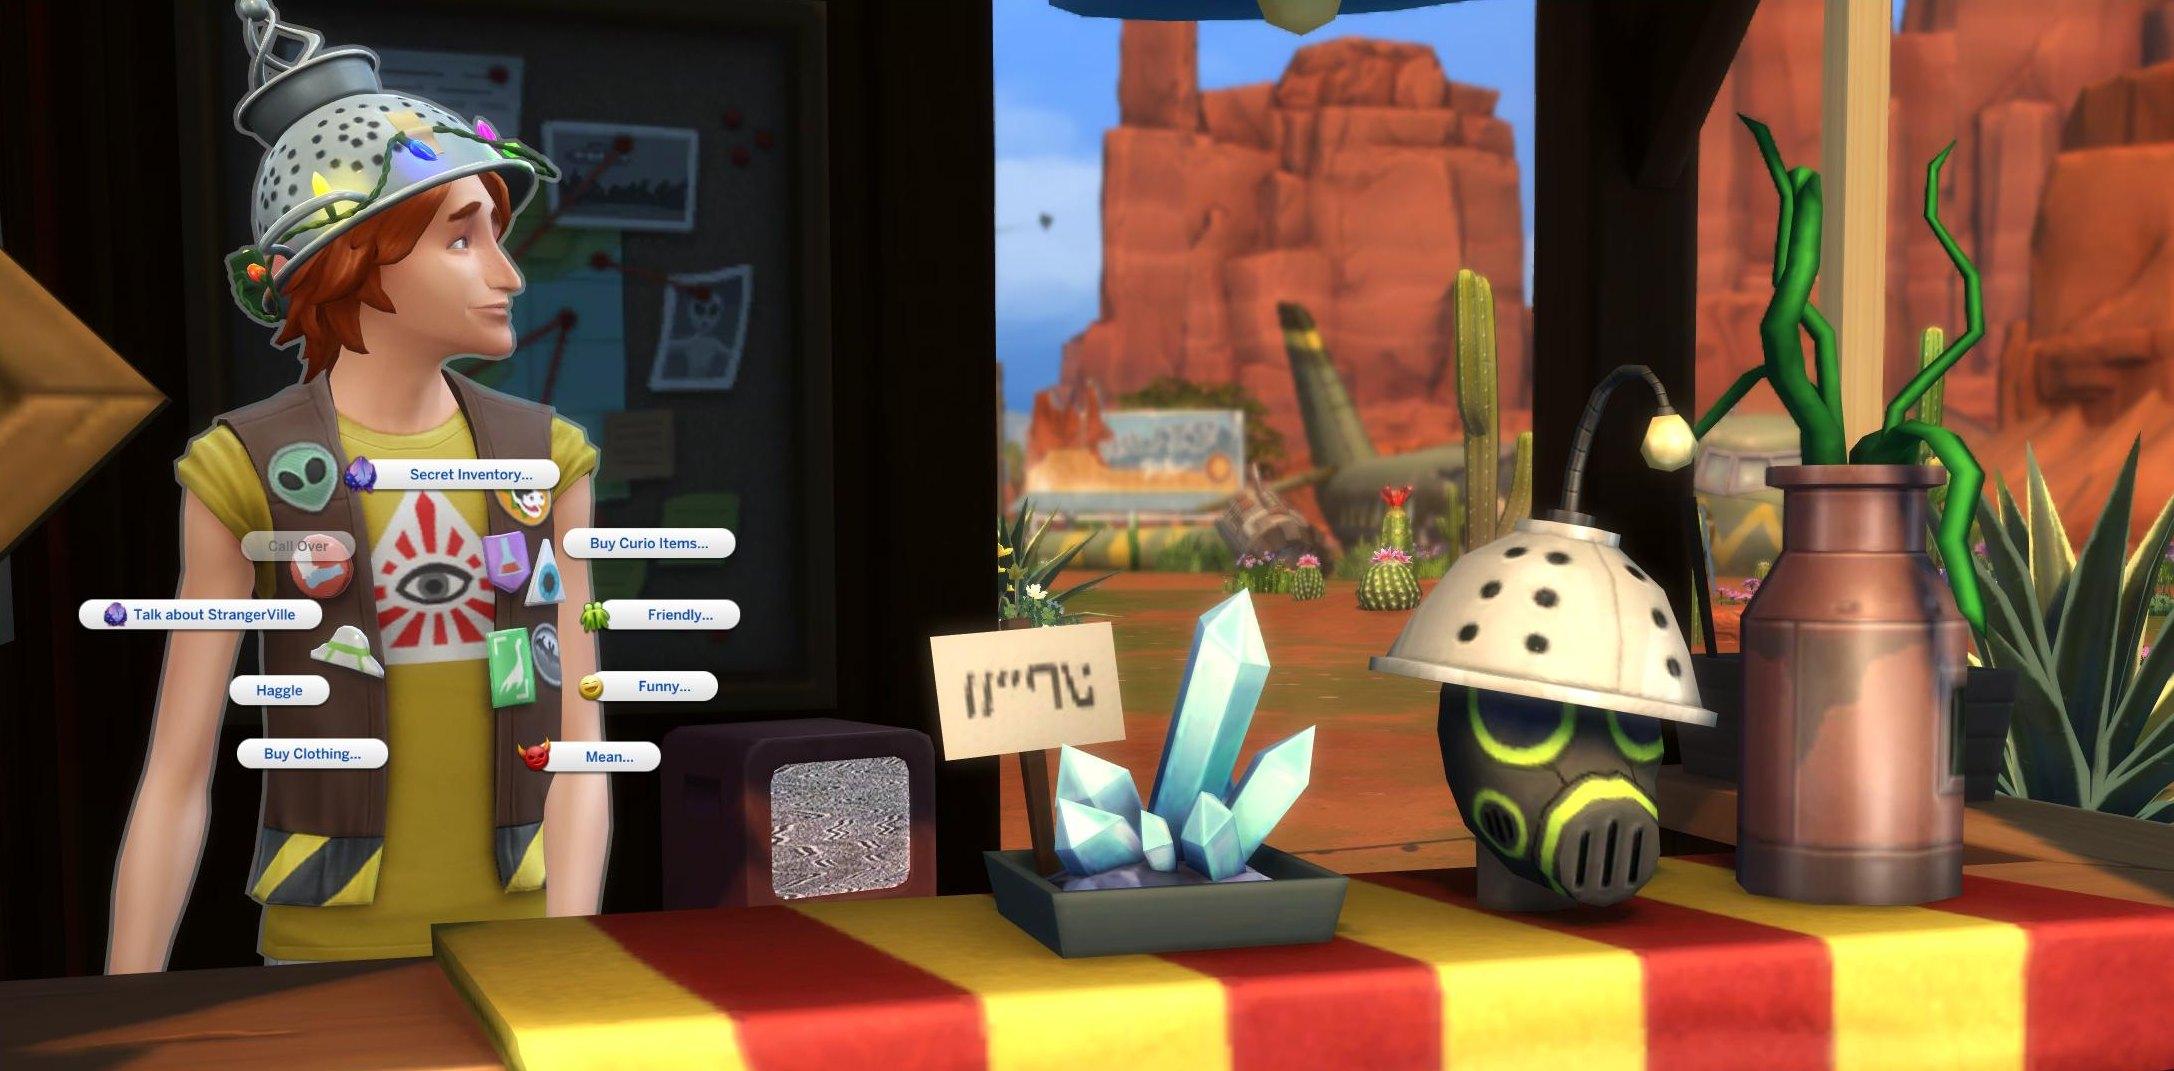 Sims 4 shopping mod